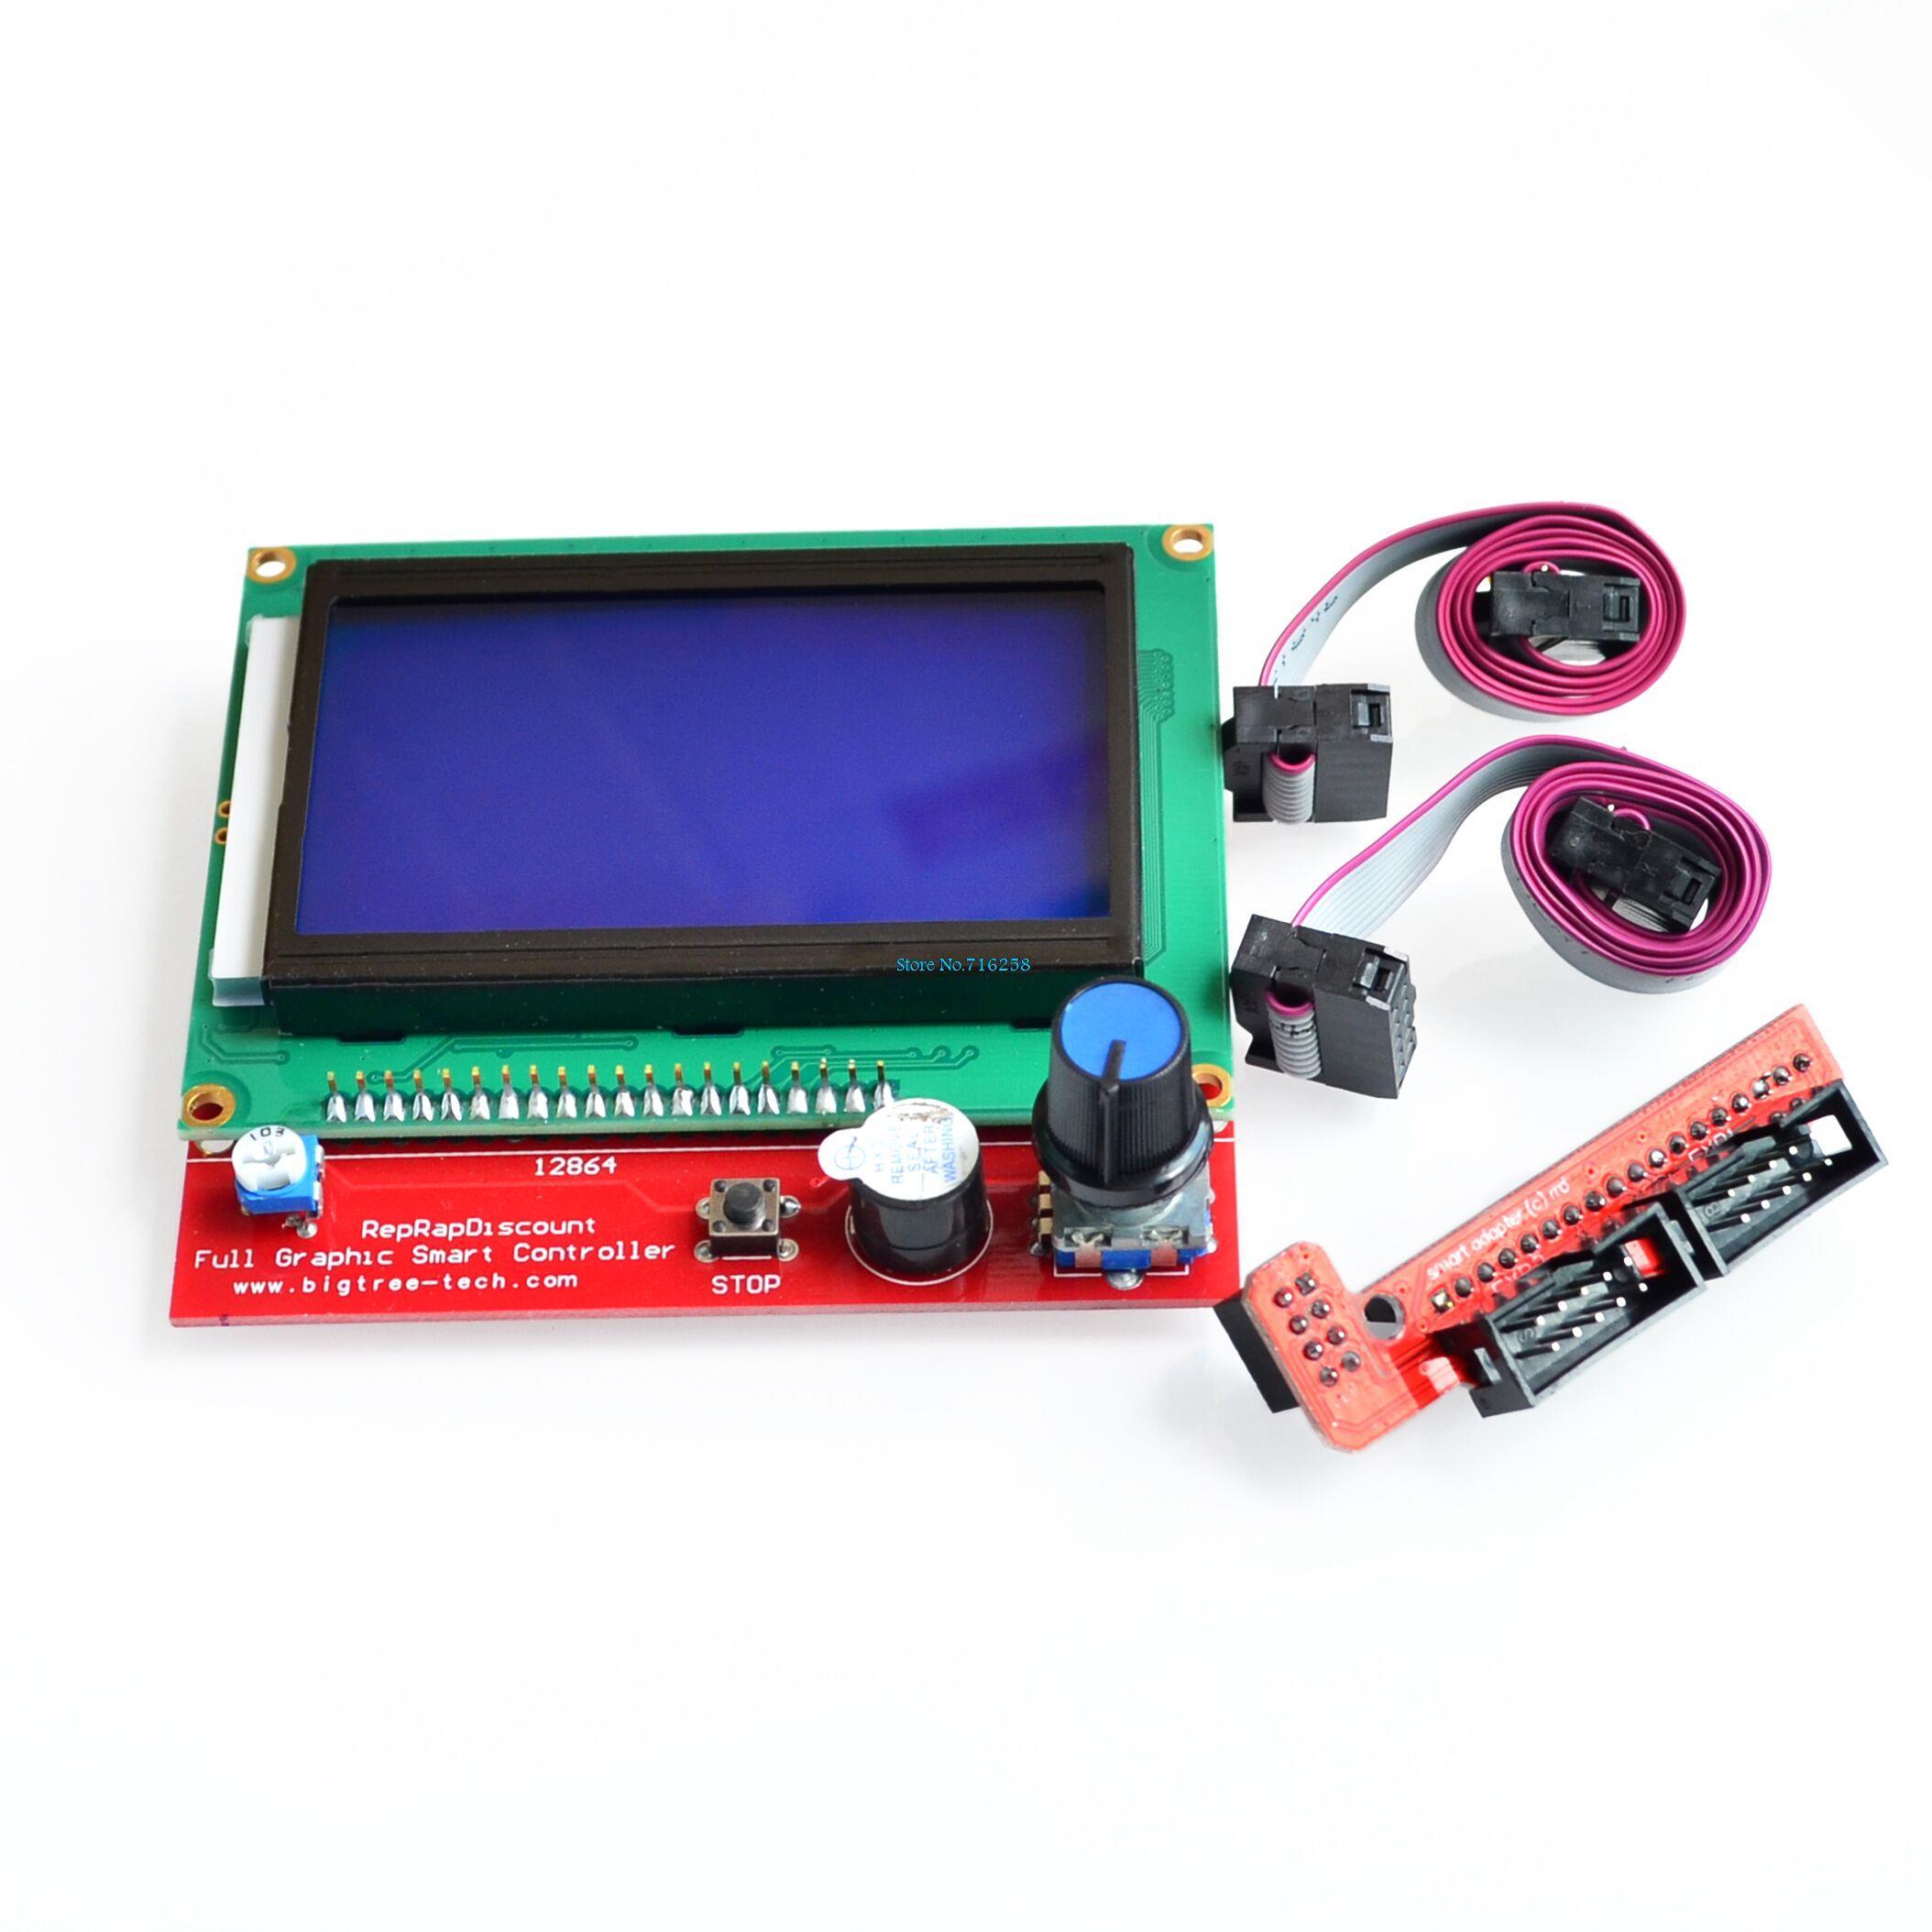 2sets/lot 3D printer smart controller RAMPS 1.4 LCD 12864 LCD control panel blue screen2sets/lot 3D printer smart controller RAMPS 1.4 LCD 12864 LCD control panel blue screen